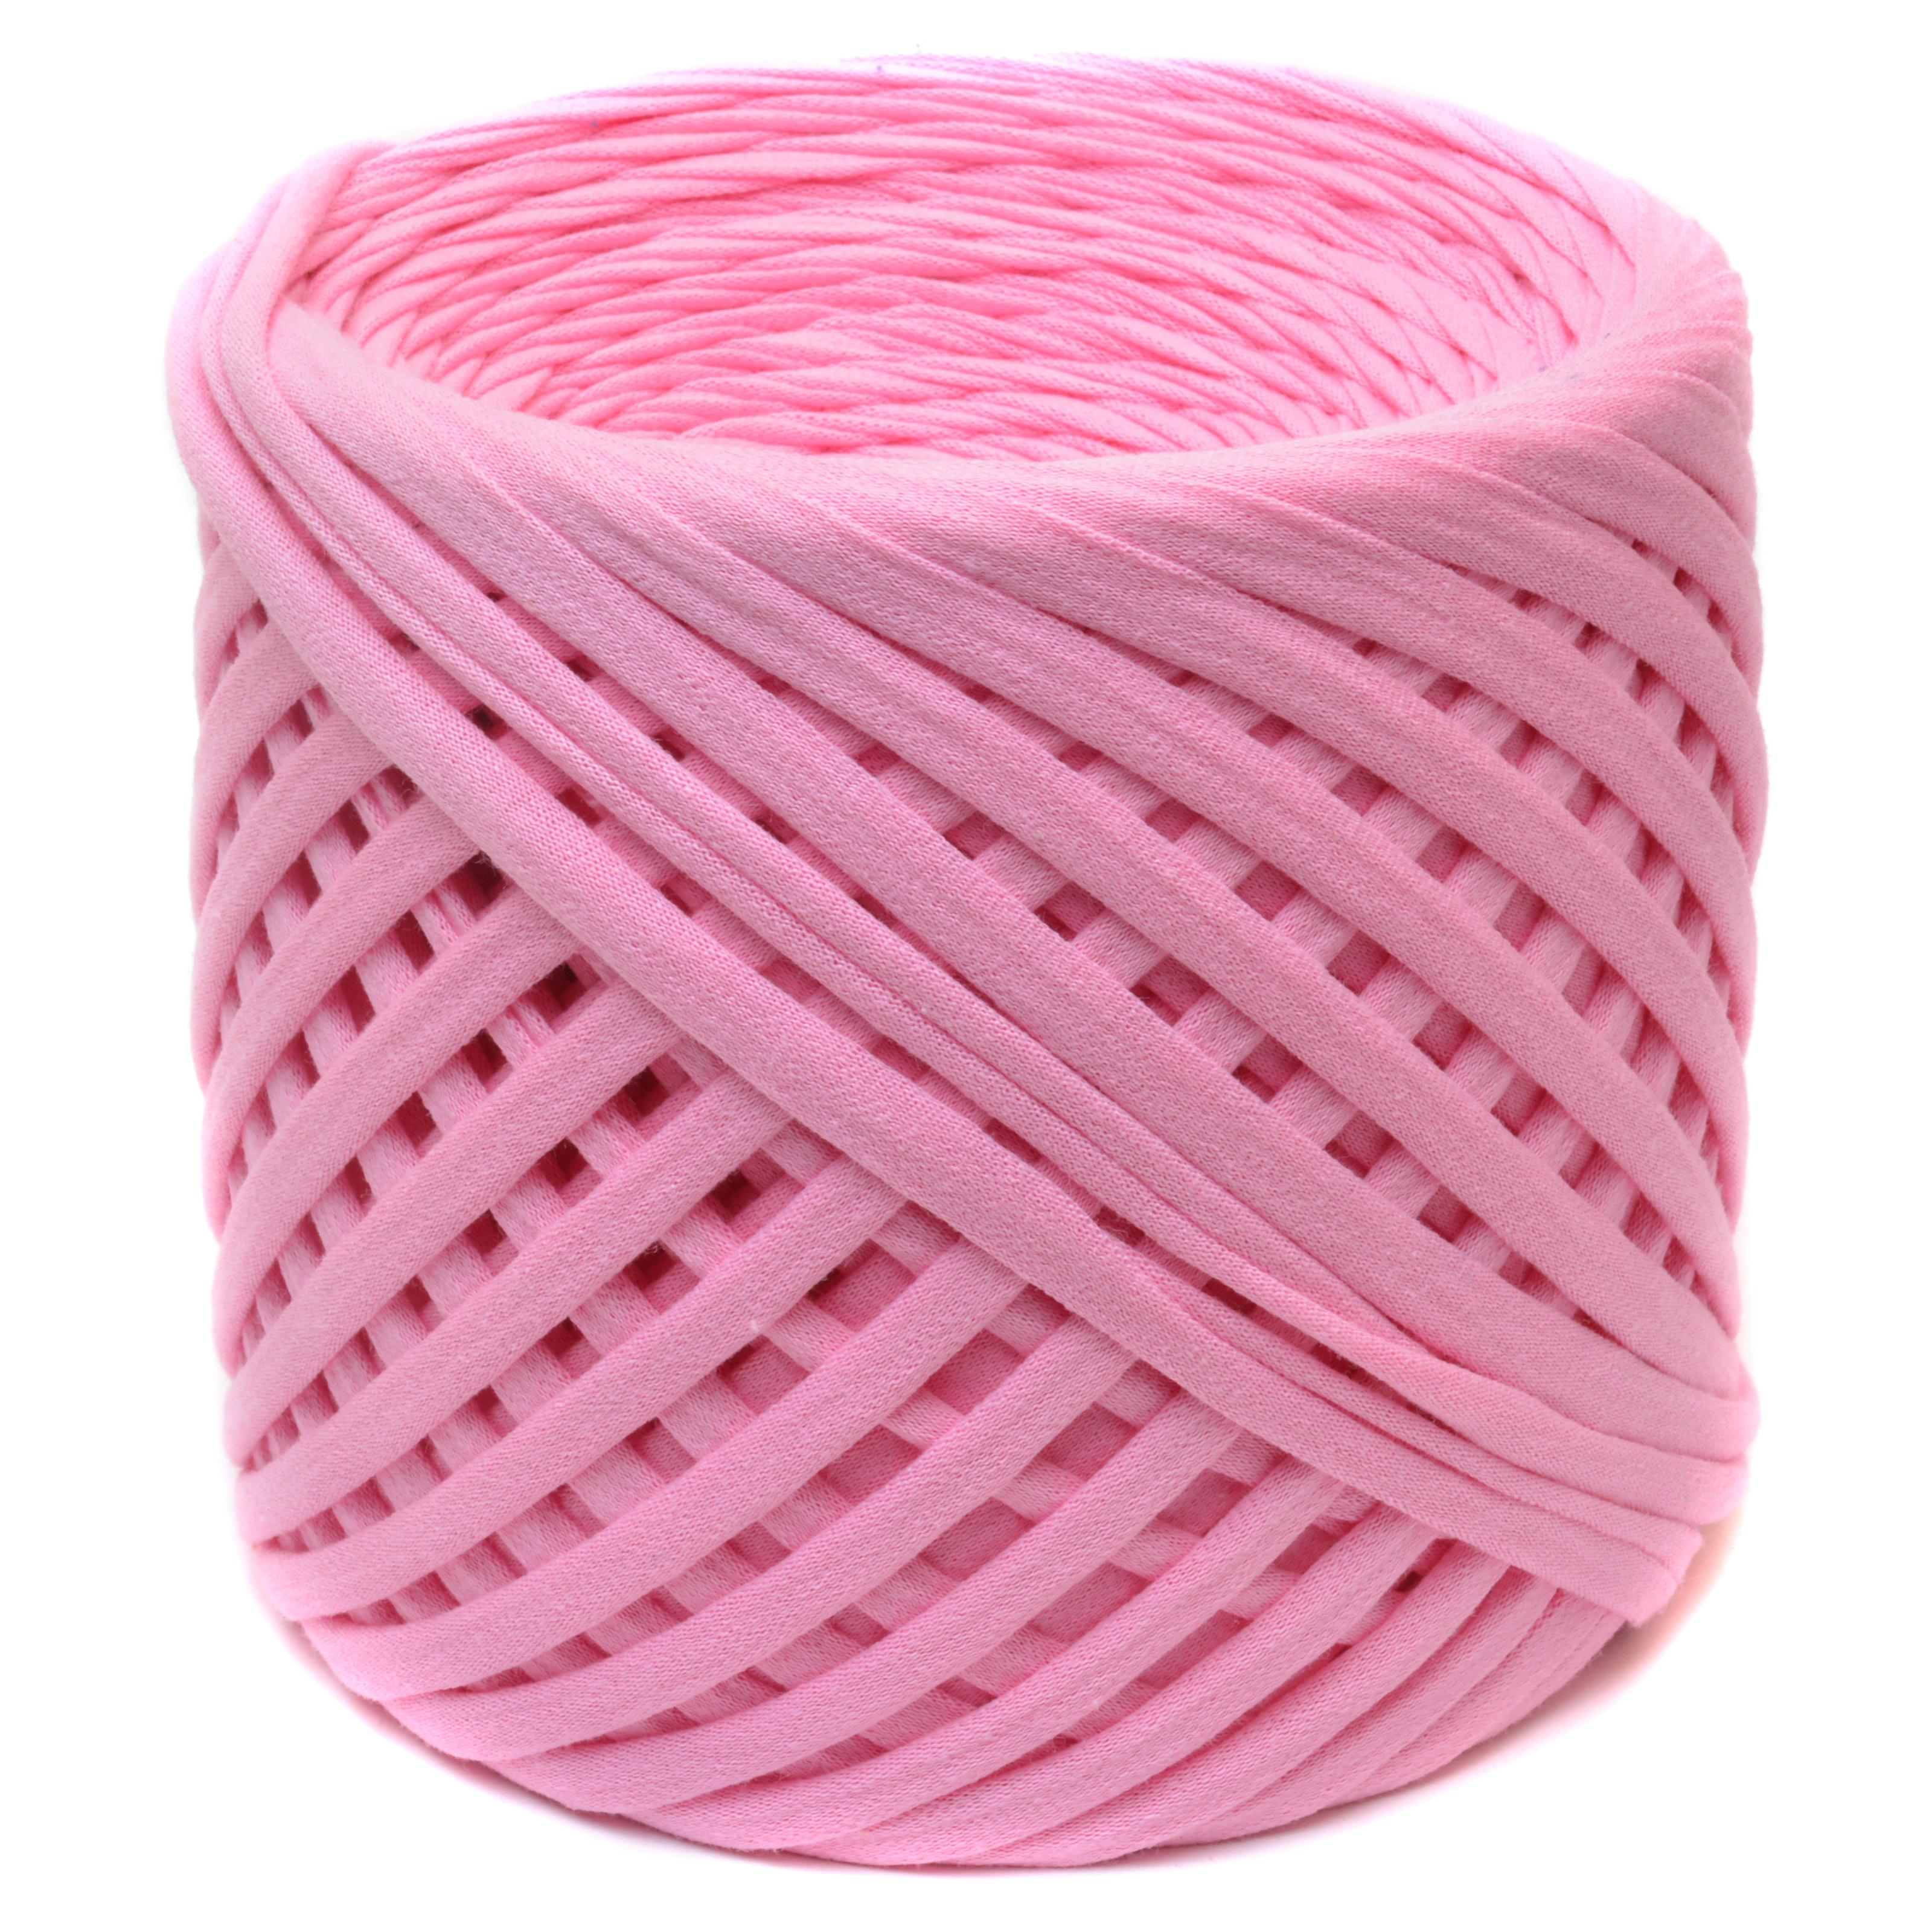 Трикотажная пряжа Saltera. Цвет Розовый (08)